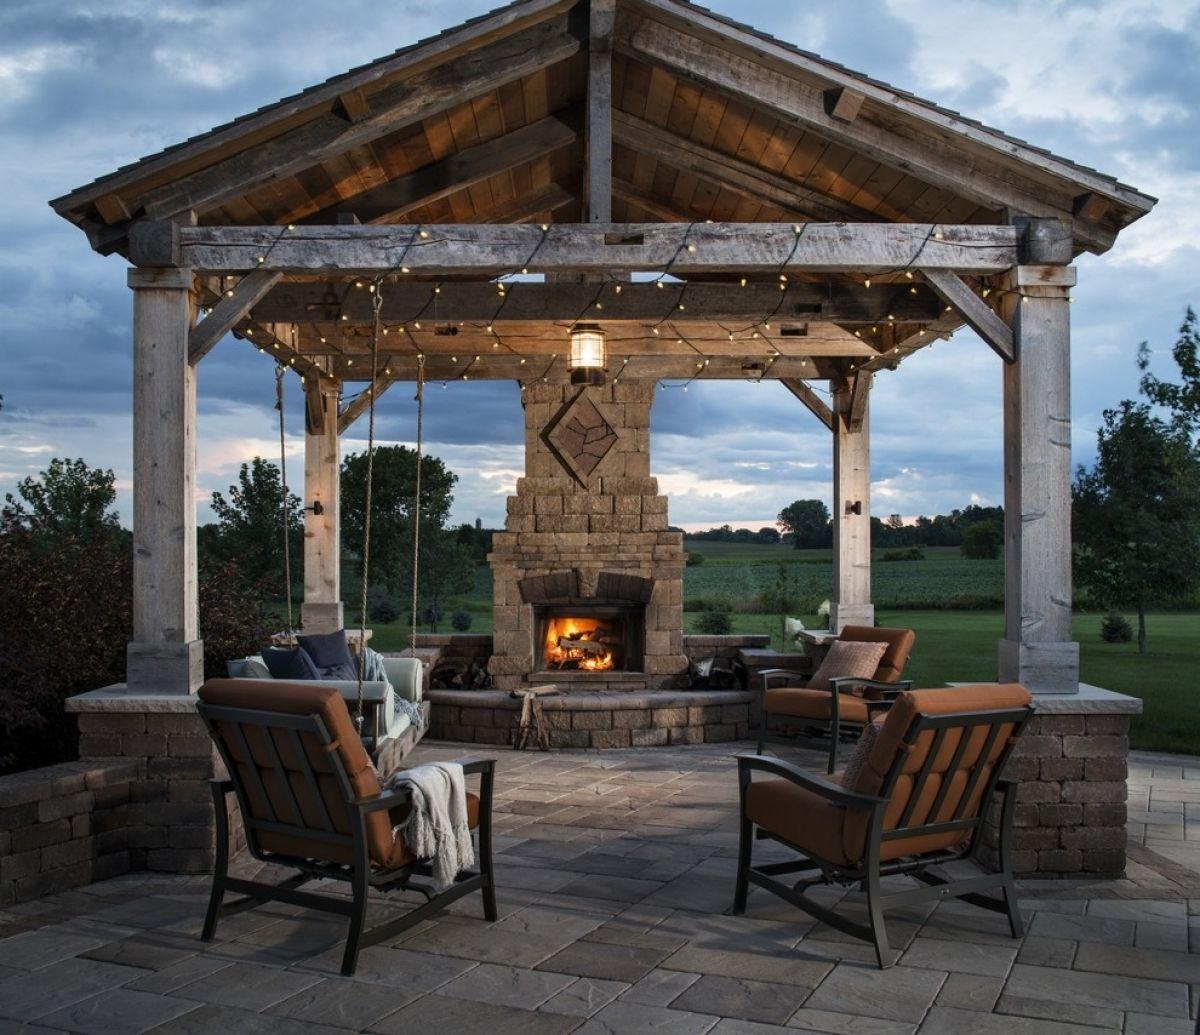 outdoor pergola gazebo patio ideas Covered Gazebos For Patios | Gazebo IDeas | Outdoors